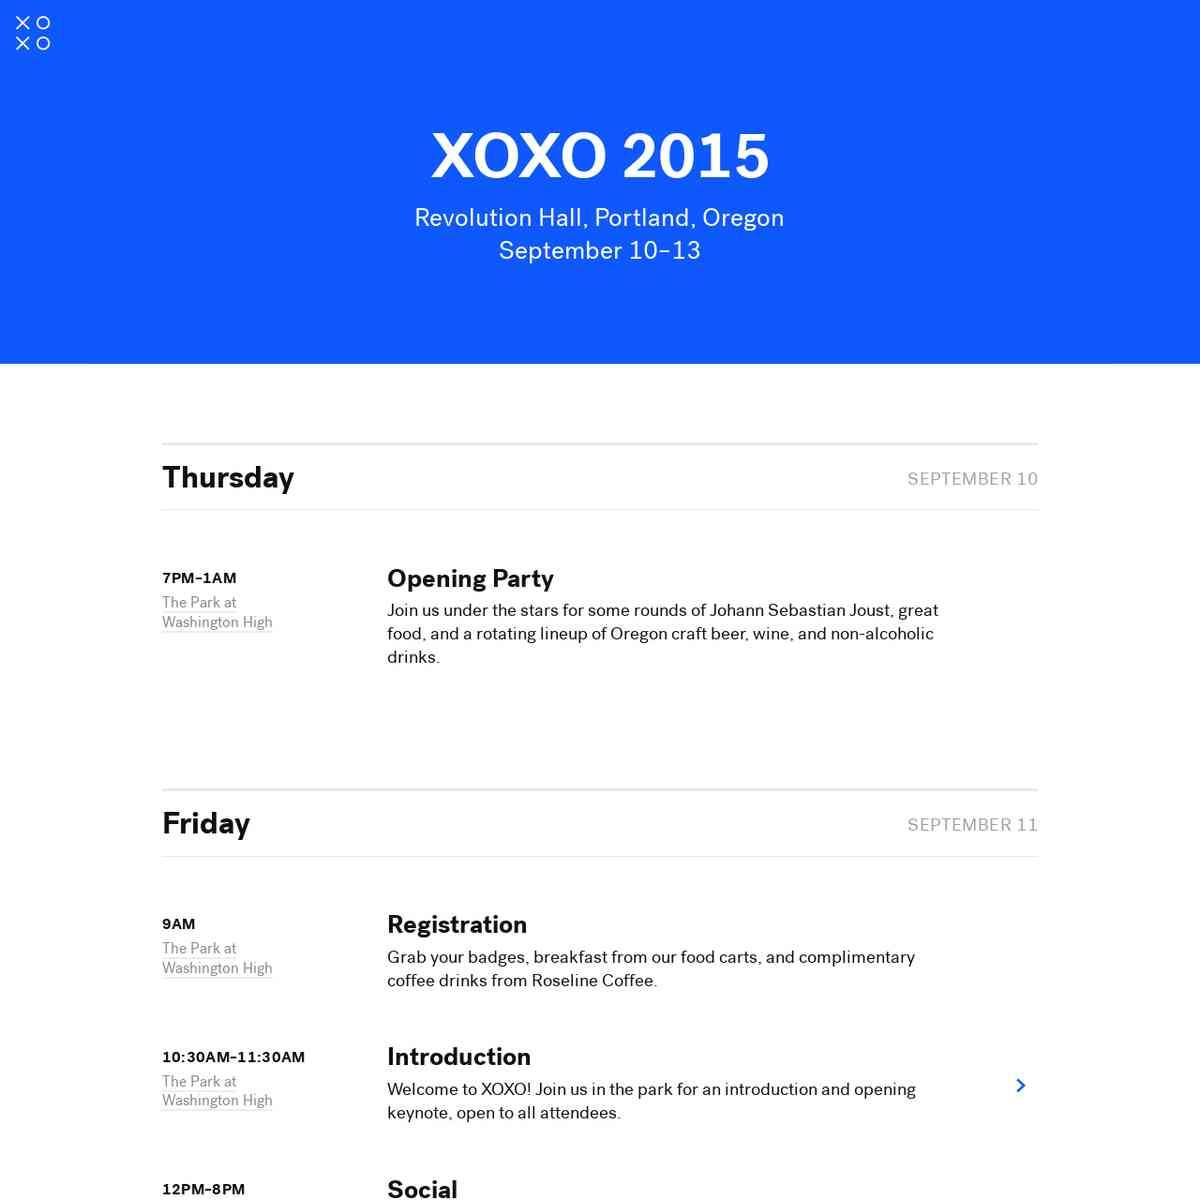 2015.xoxofest.com